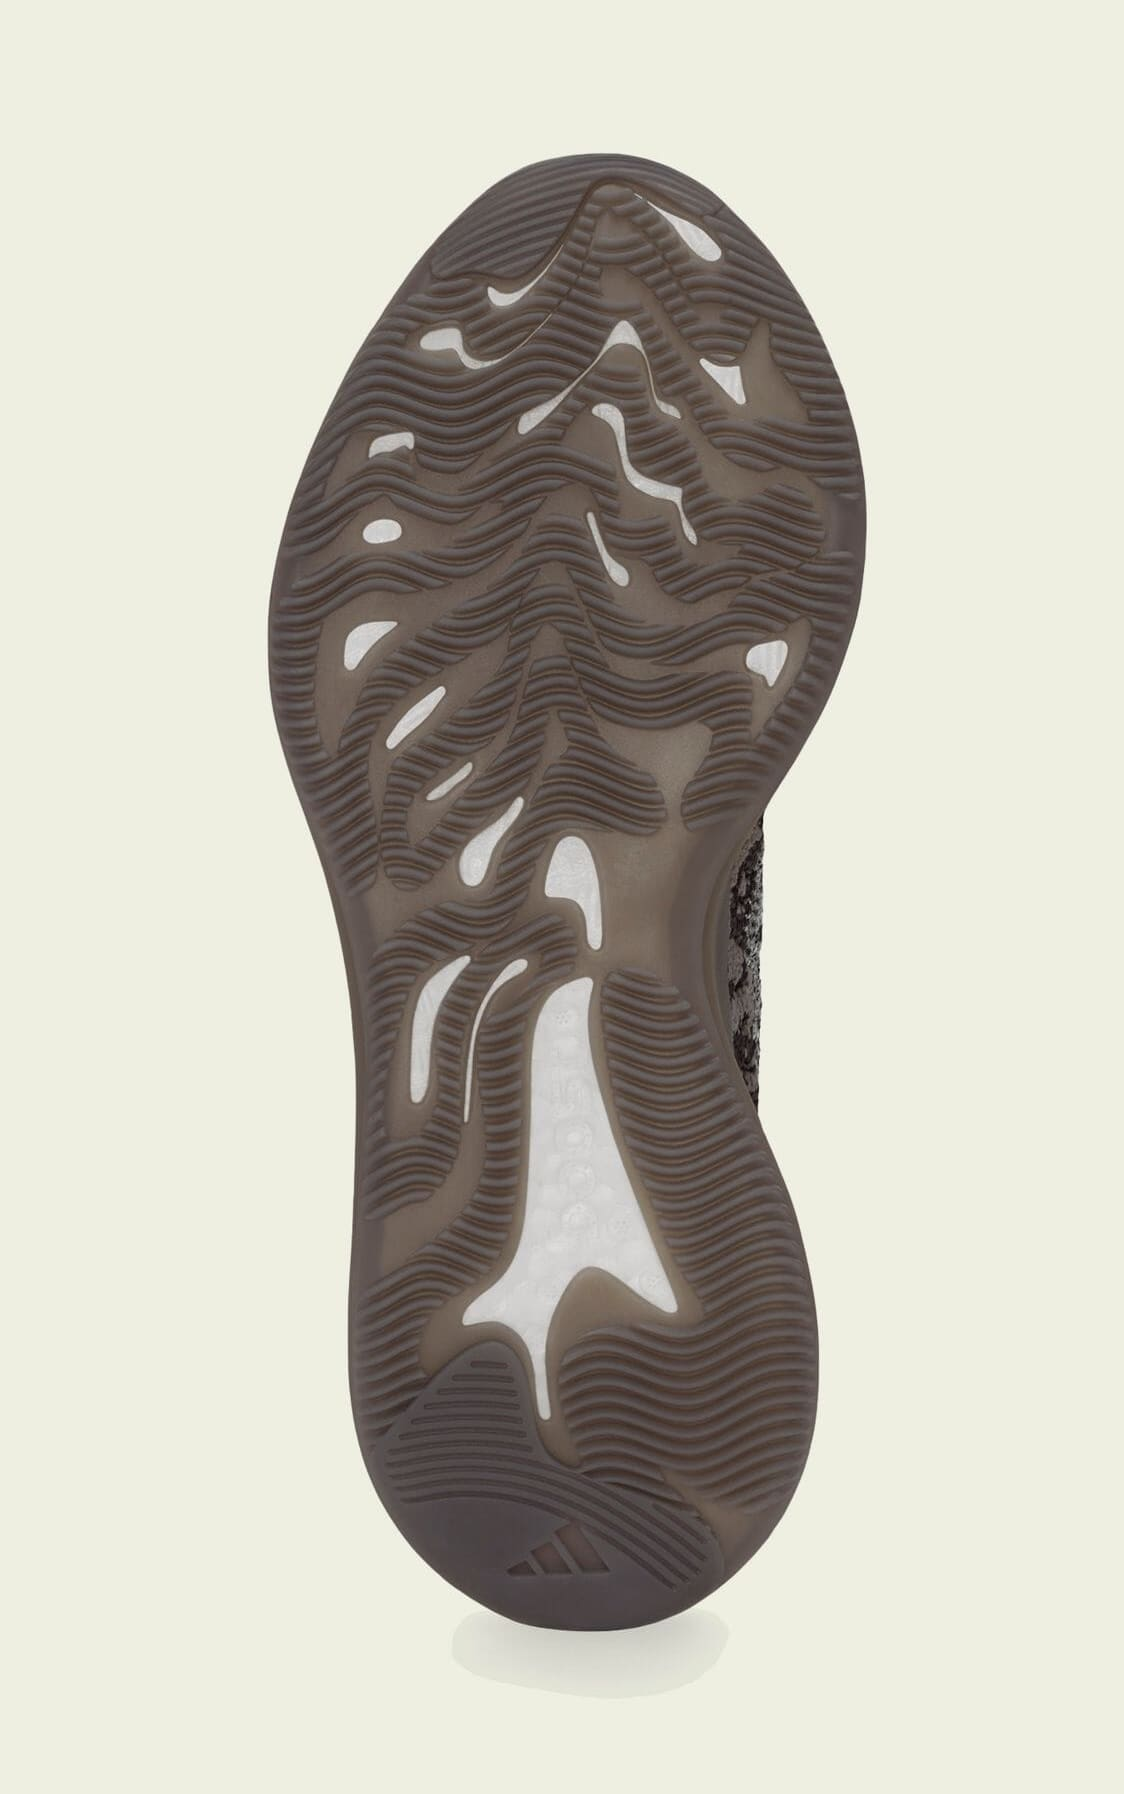 Adidas Yeezy Boost 380 'Stone Salt' GZ0472 Outsole